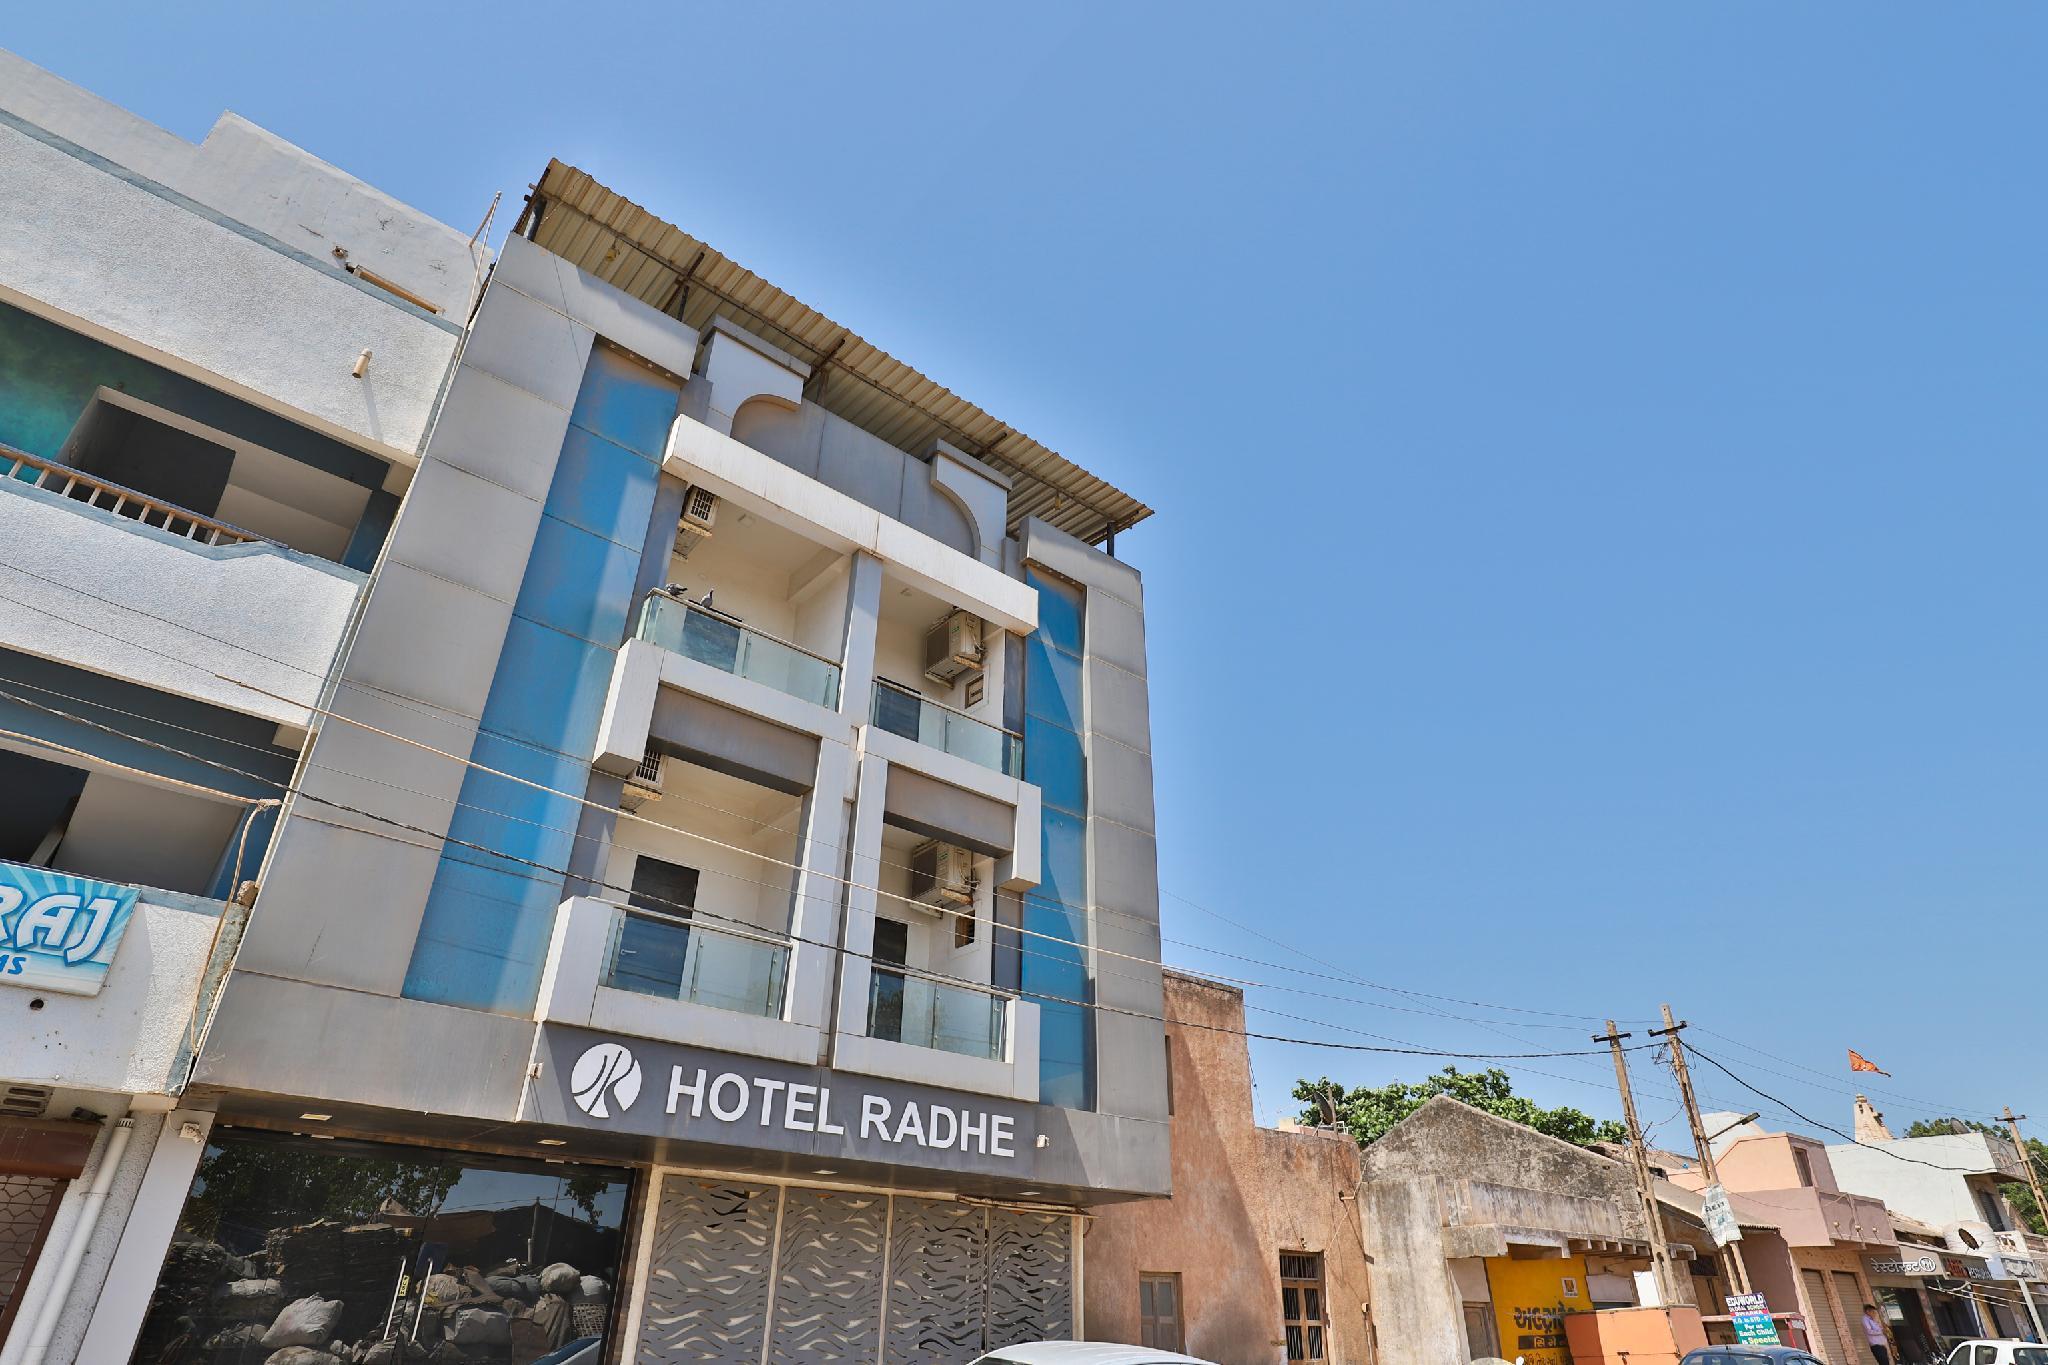 OYO 3165 Hotel Radhe, Devbhumi Dwarka